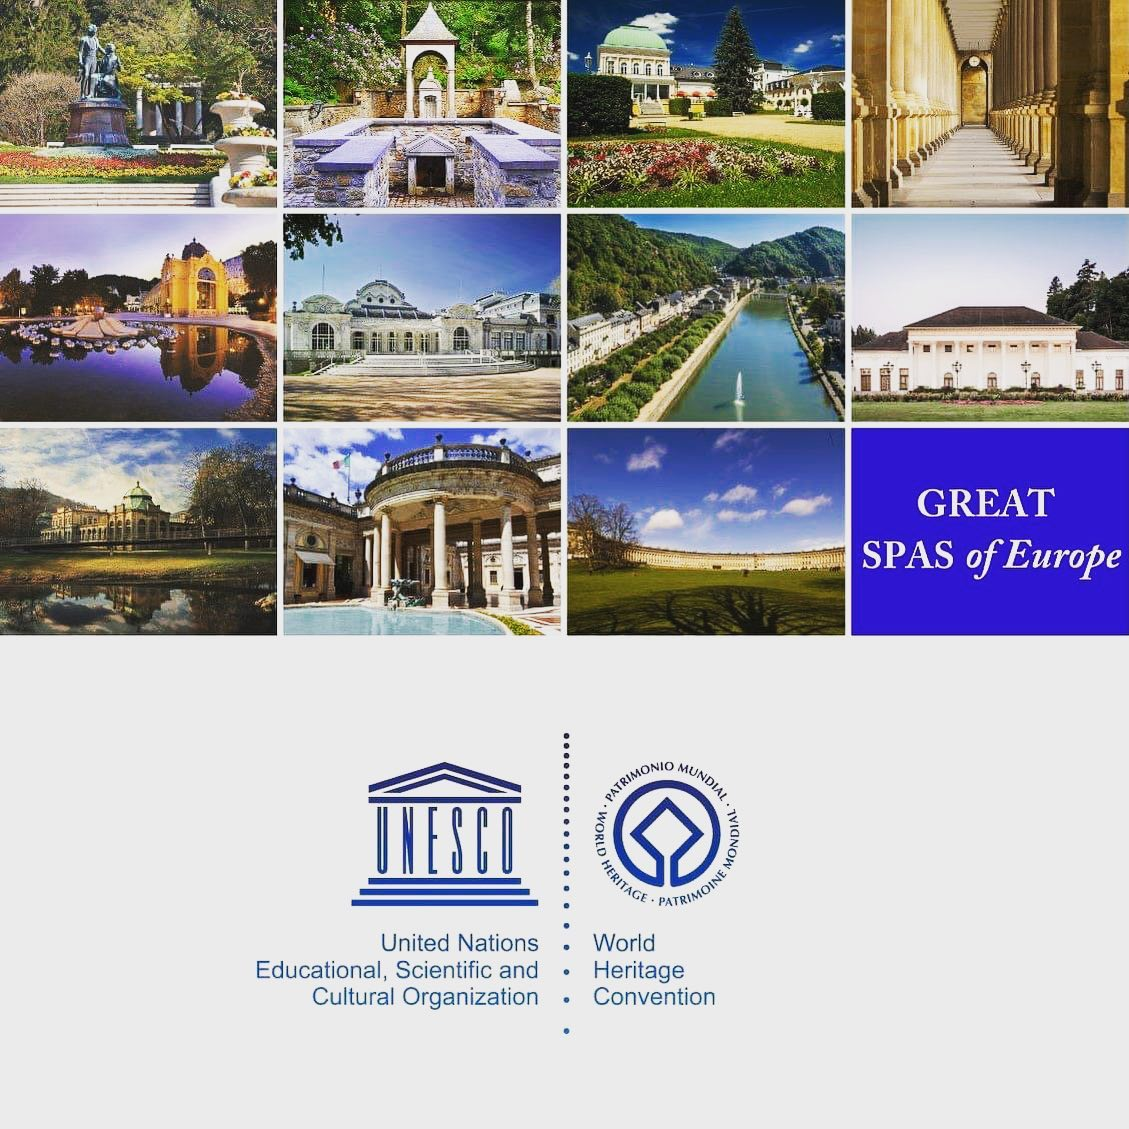 Great Spas of Europe. Photo: From Facebook site. https://www.facebook.com/ImperialFrantiskovyLazne/photos/a.3392732740814952/4118390091582543/